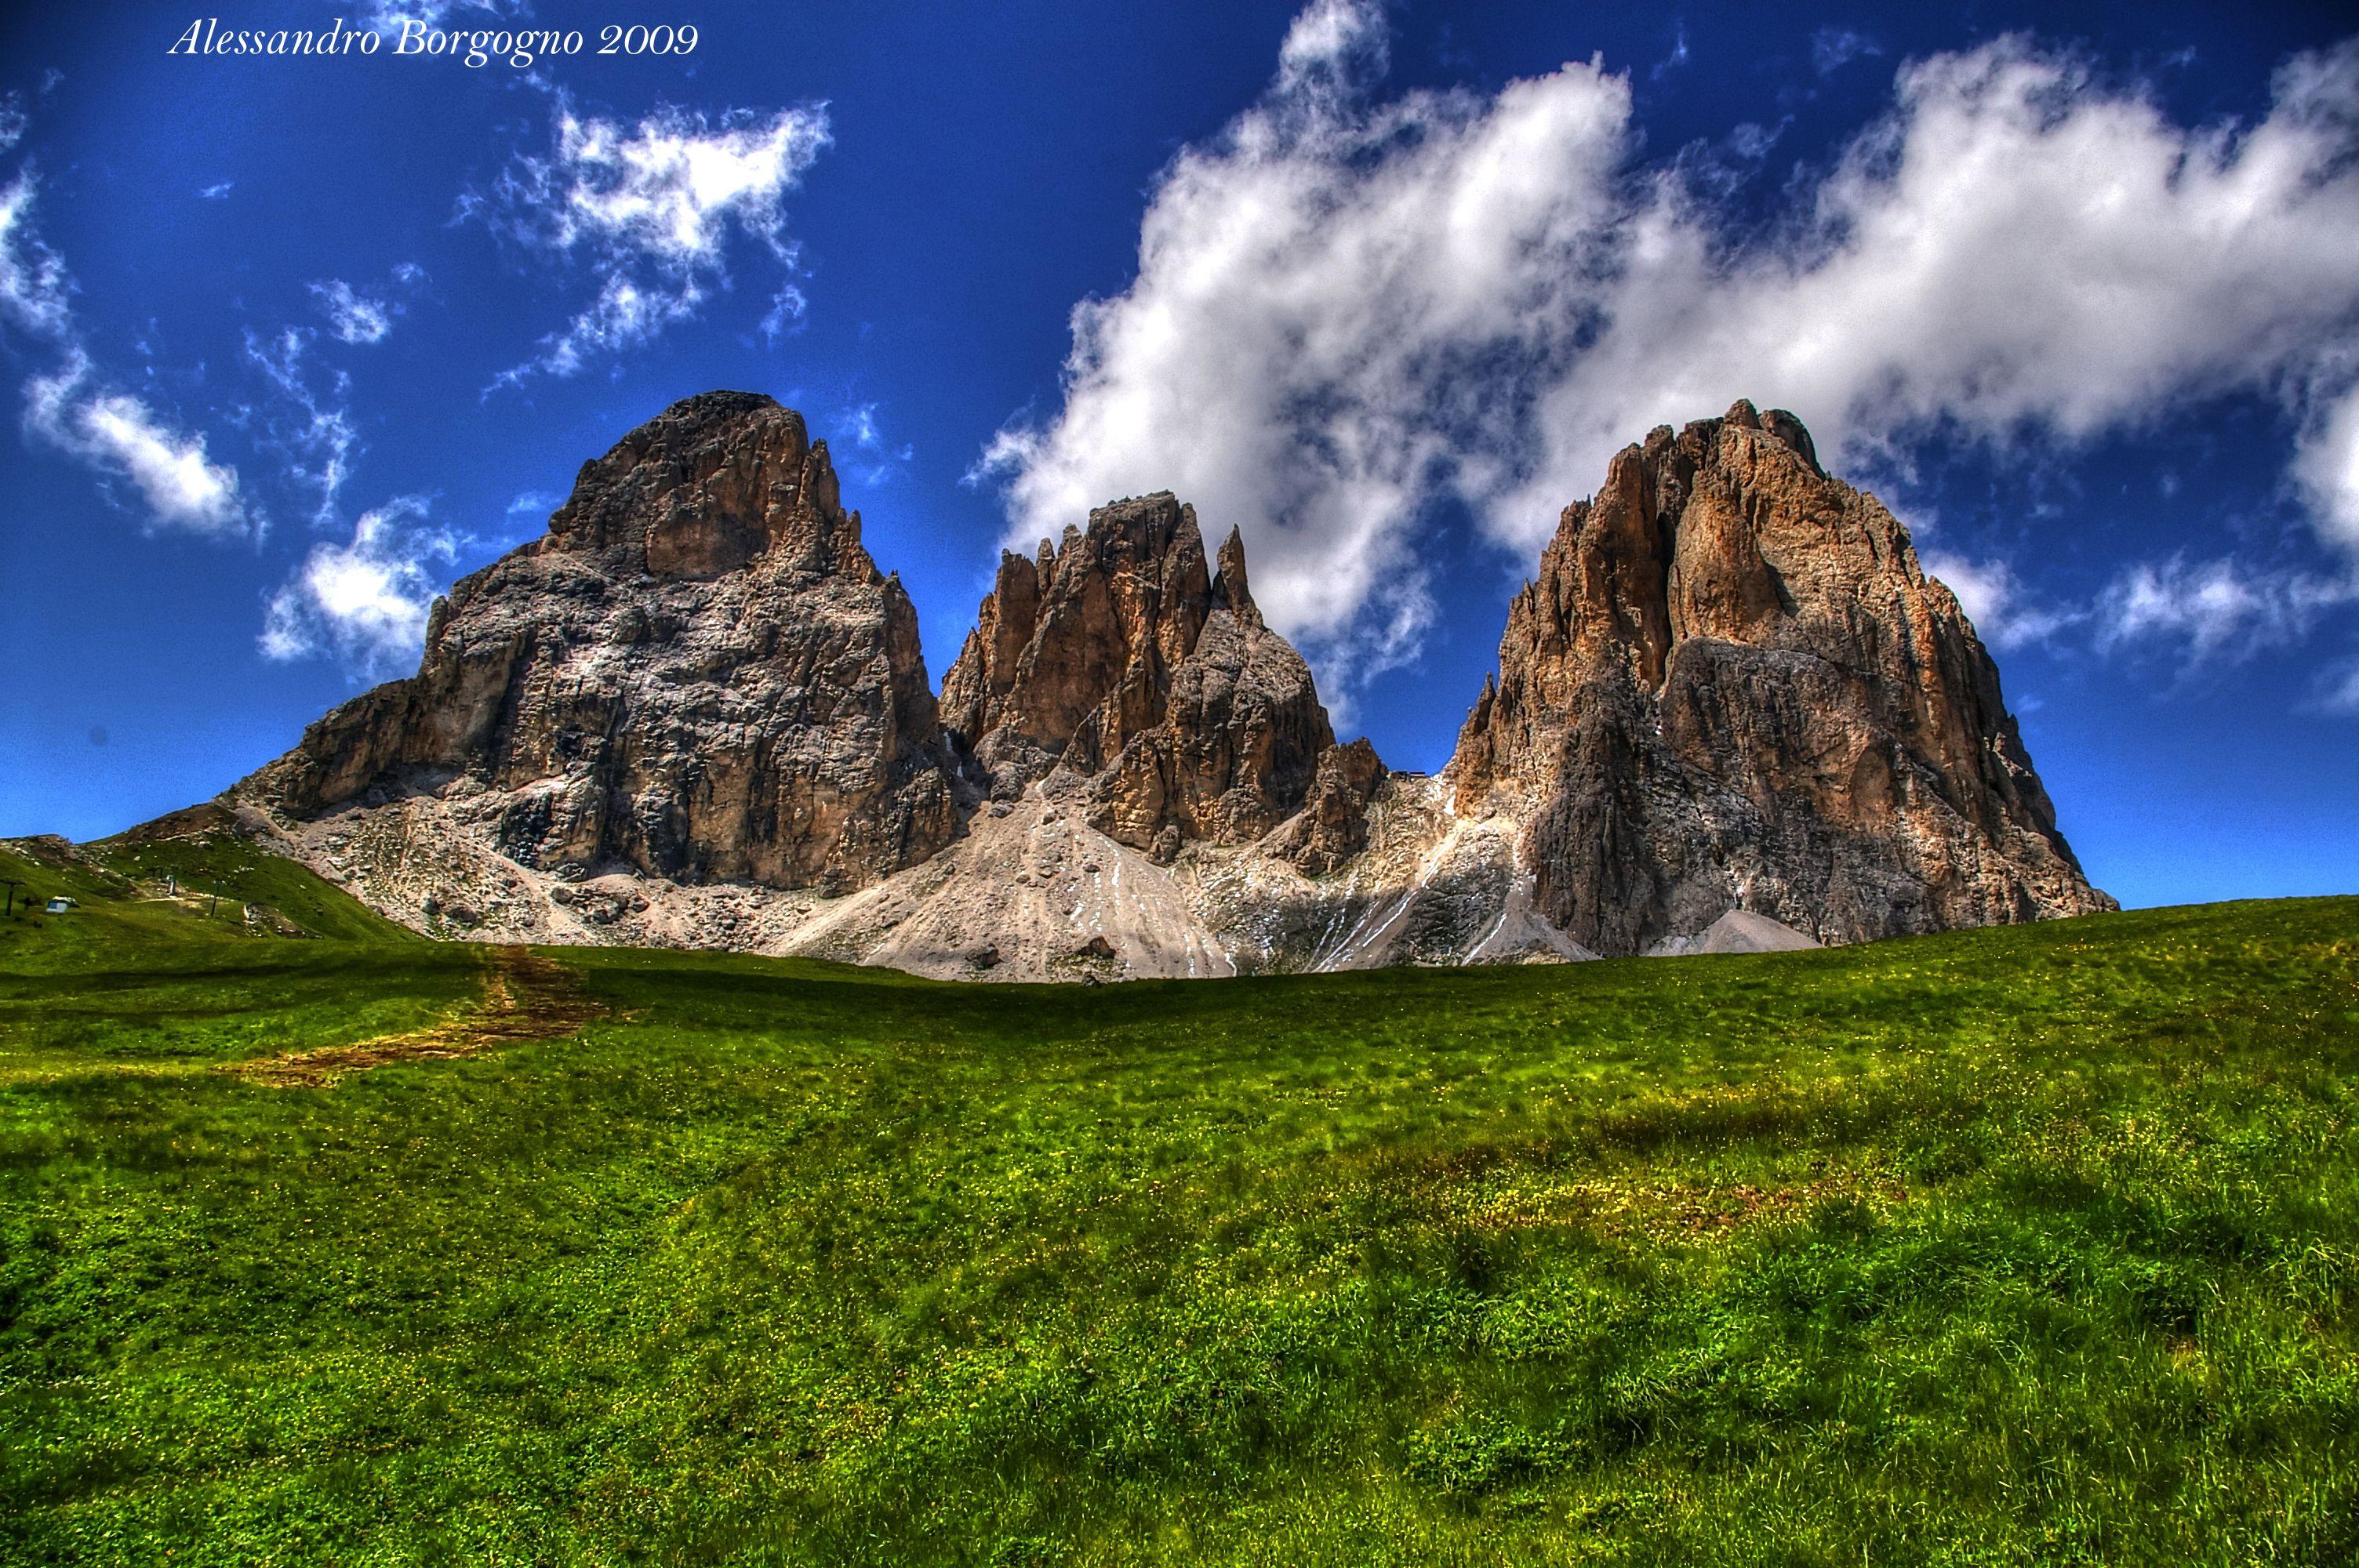 Sass Long Val di Fassa Italy / by Alessandro